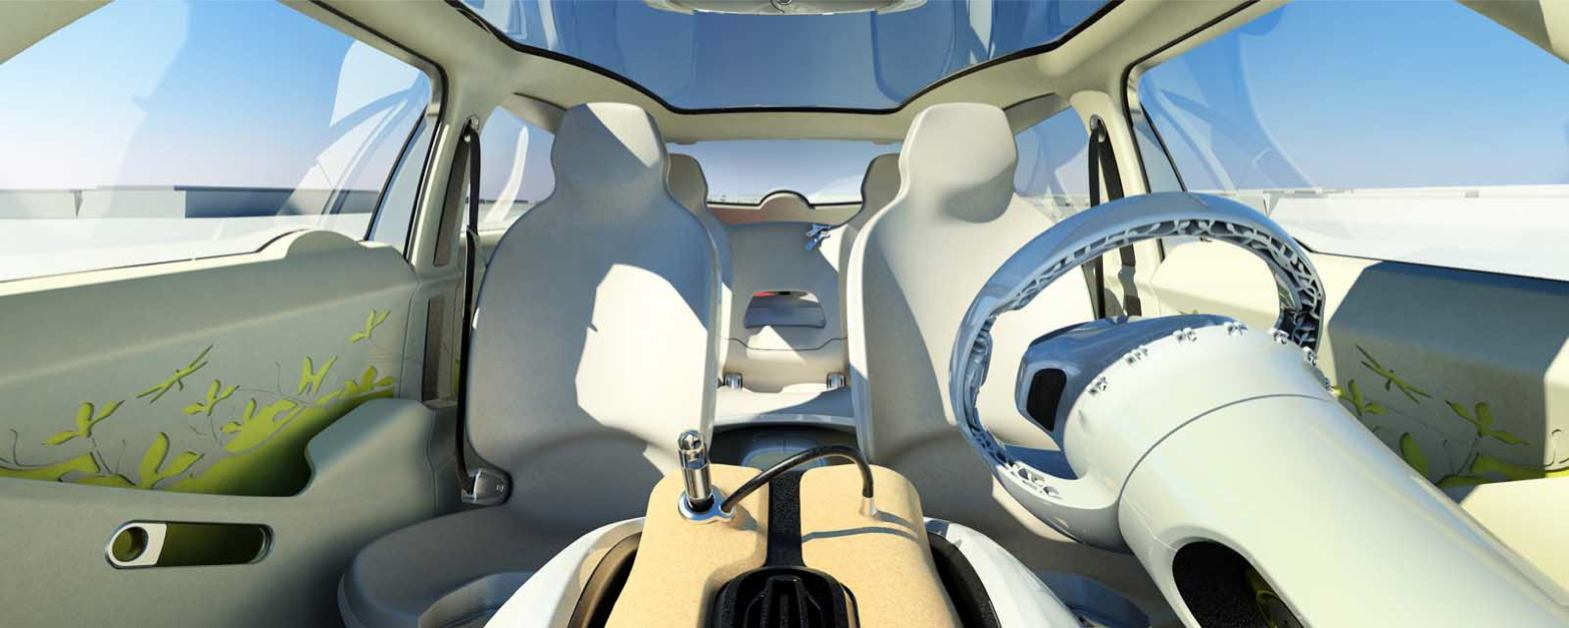 citroen c cactus concept concept car photo. Black Bedroom Furniture Sets. Home Design Ideas